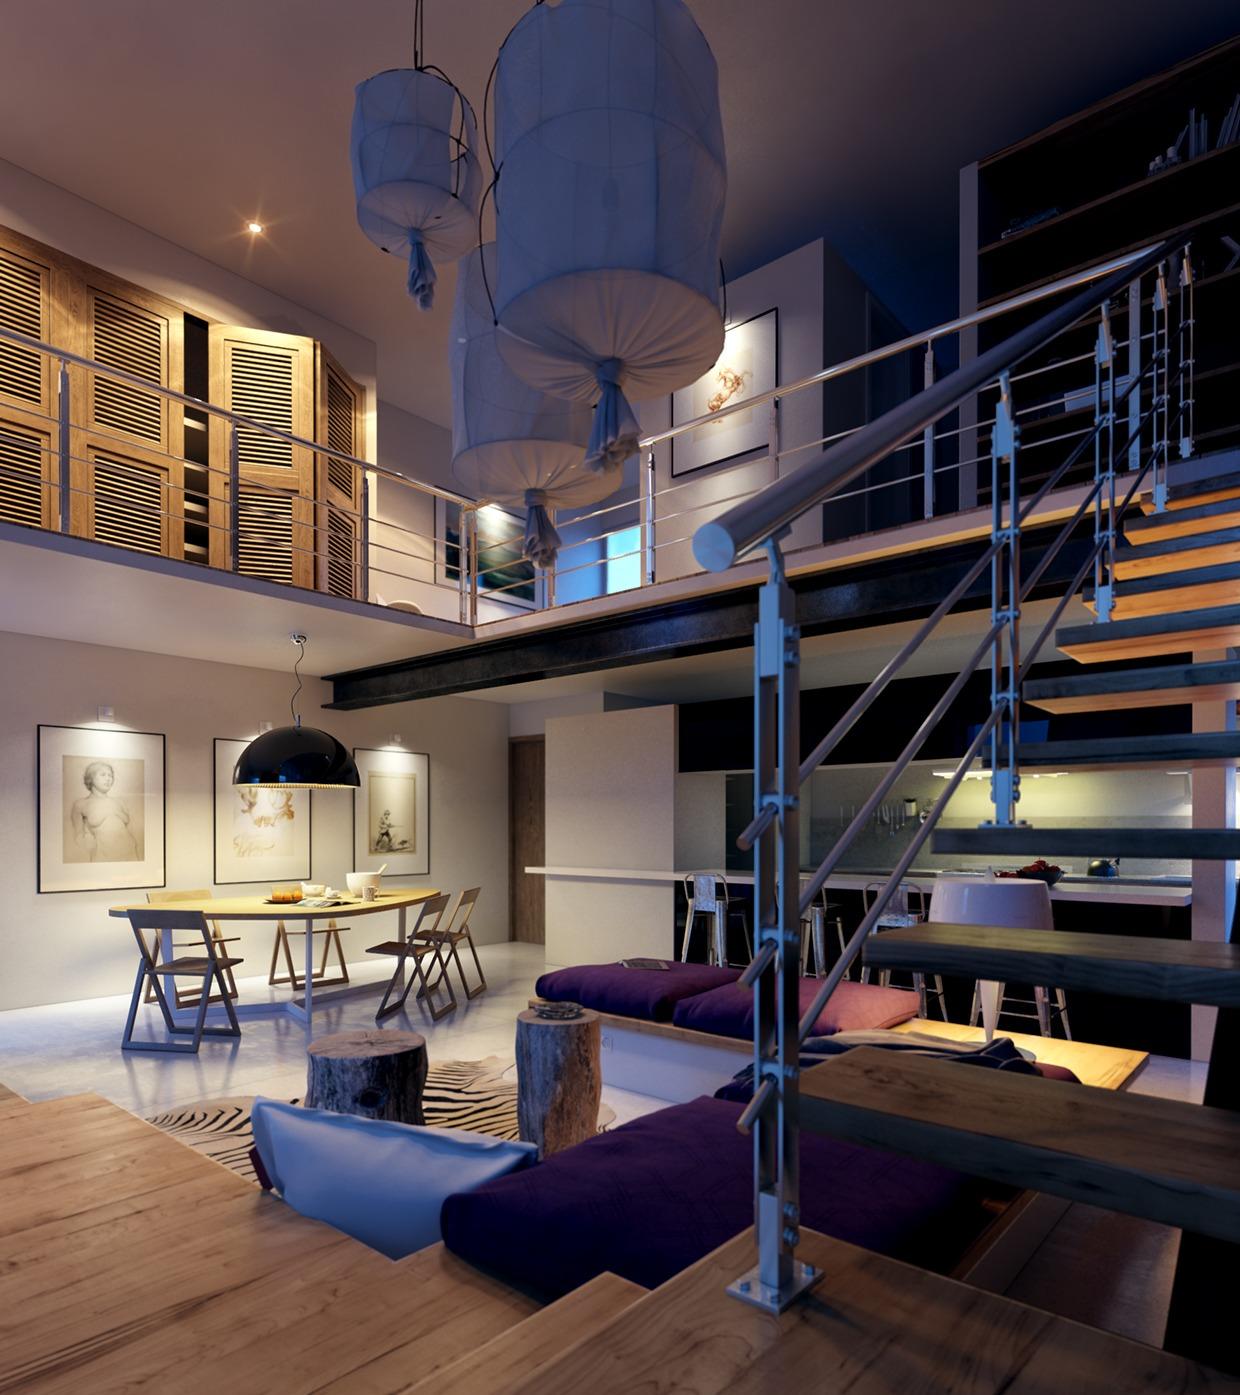 Industrial Style Moebel Accessoires Haus